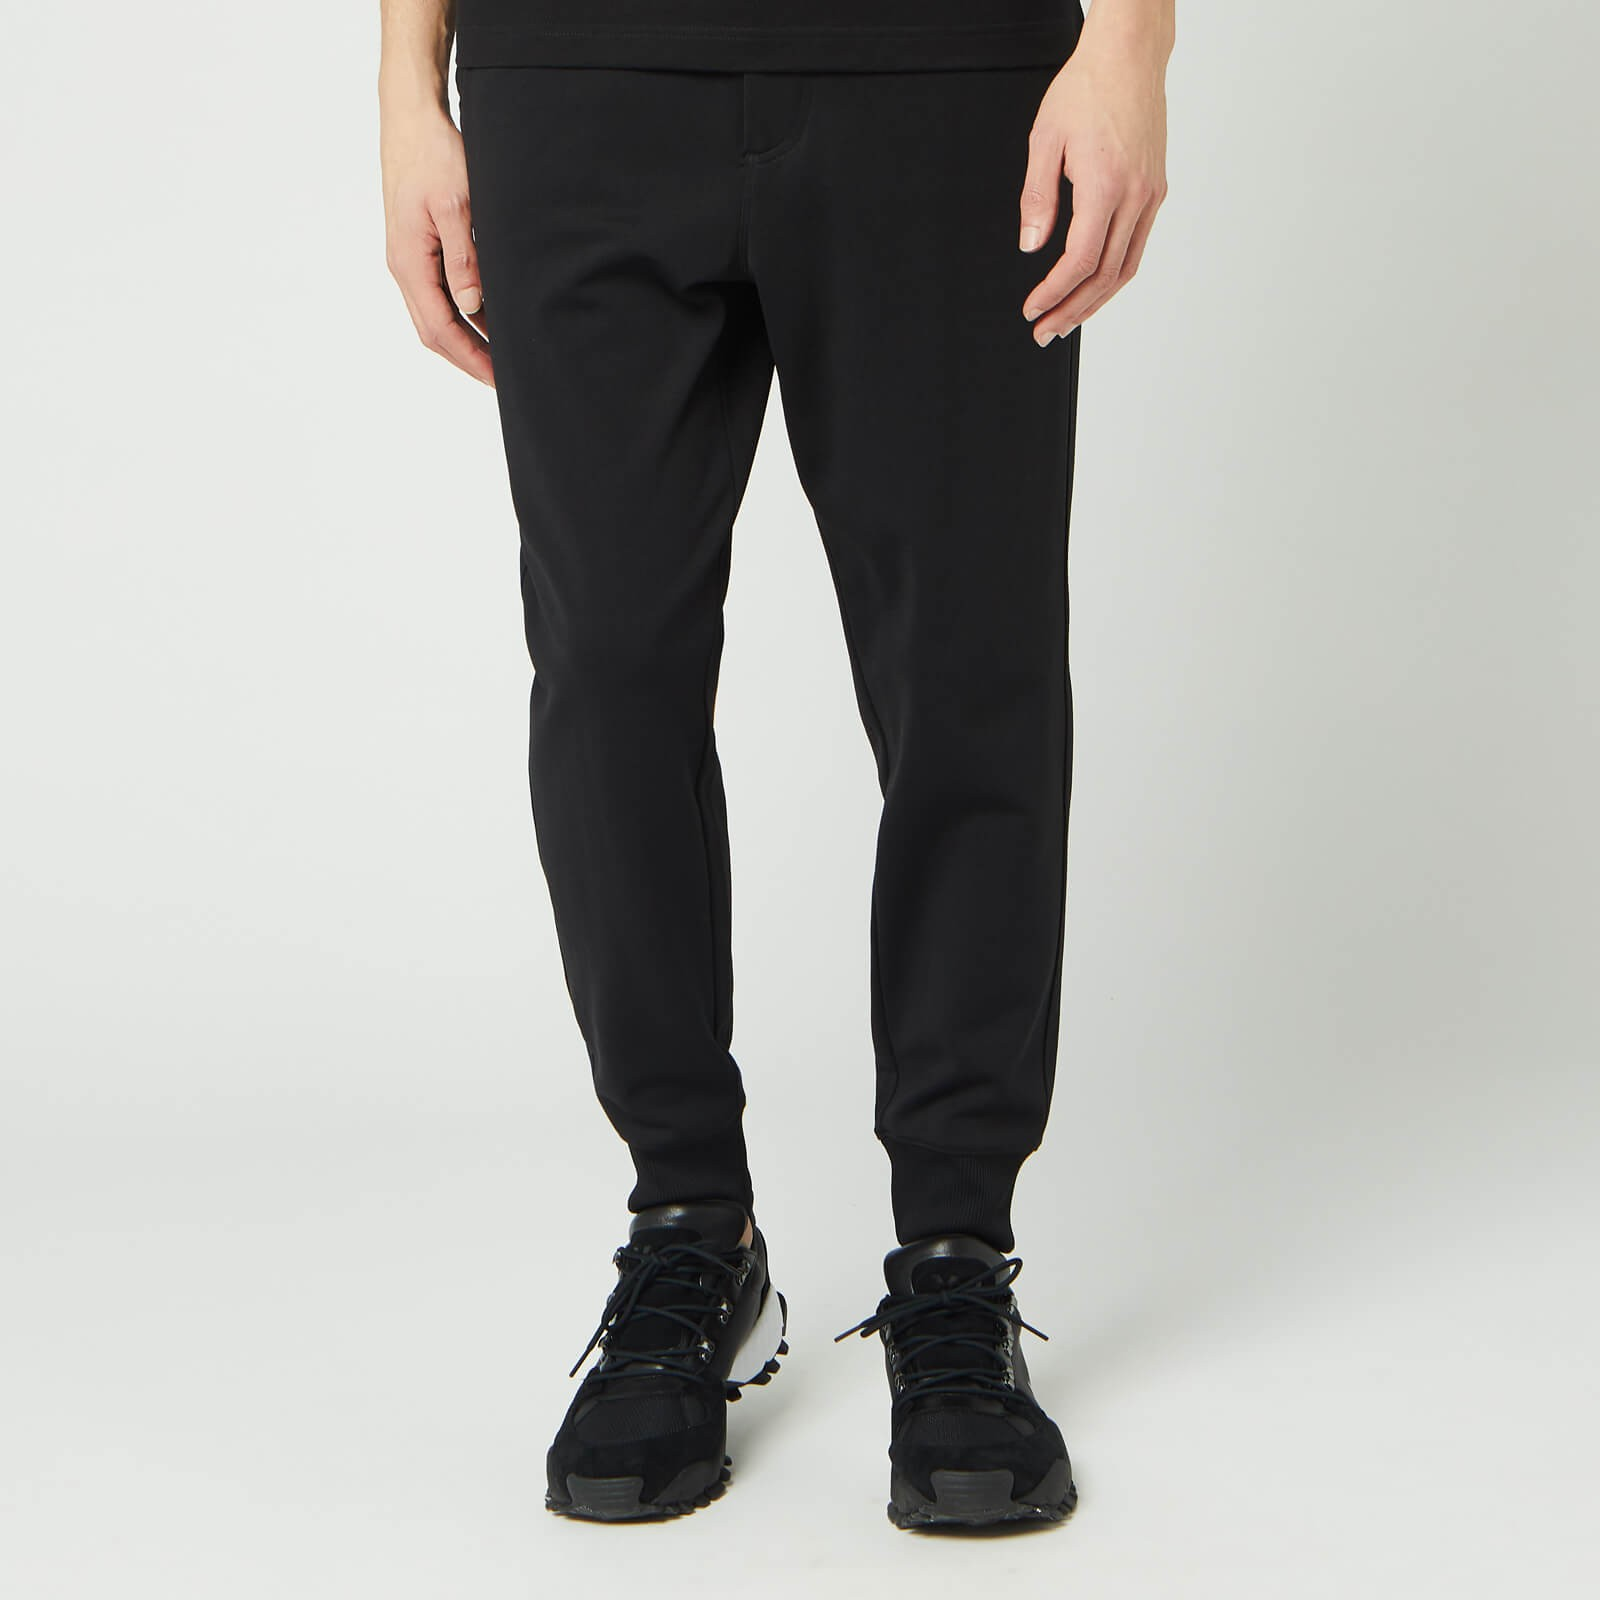 Y-3 男士运动卫裤